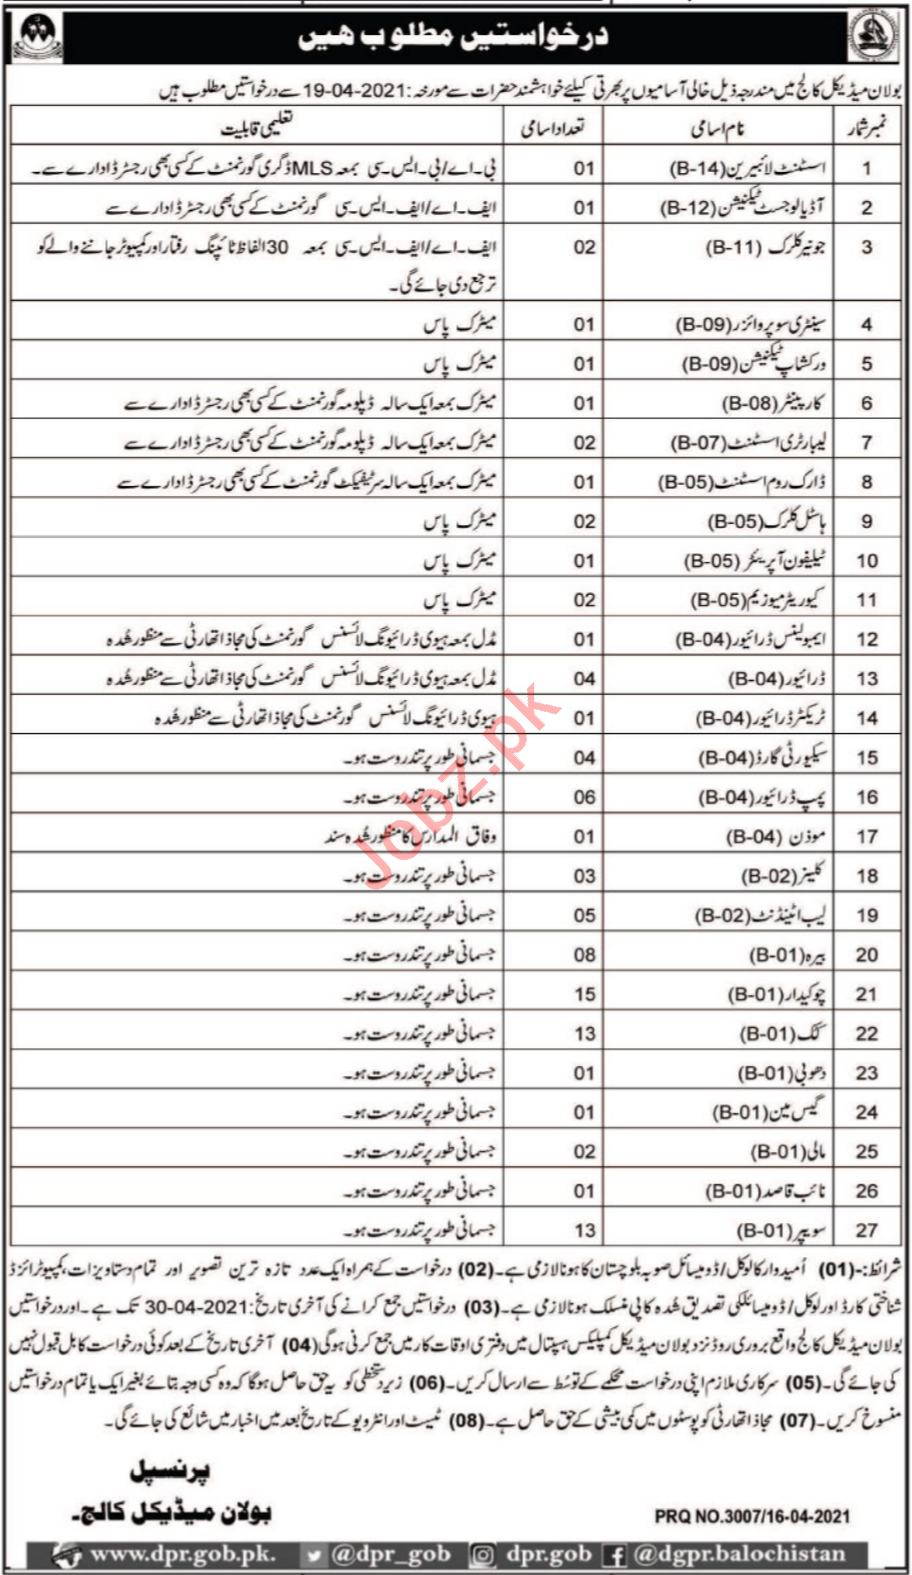 Bolan Medical College BMC Quetta Jobs 2021 for Junior Clerk